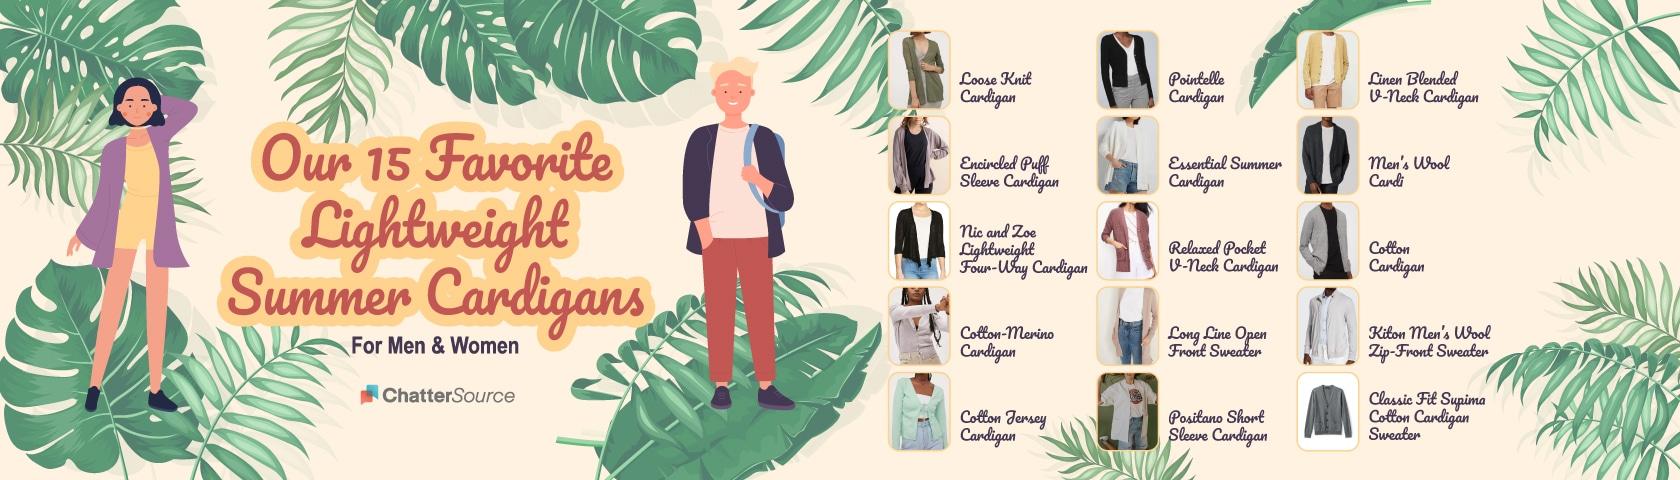 summer cardigan infographic